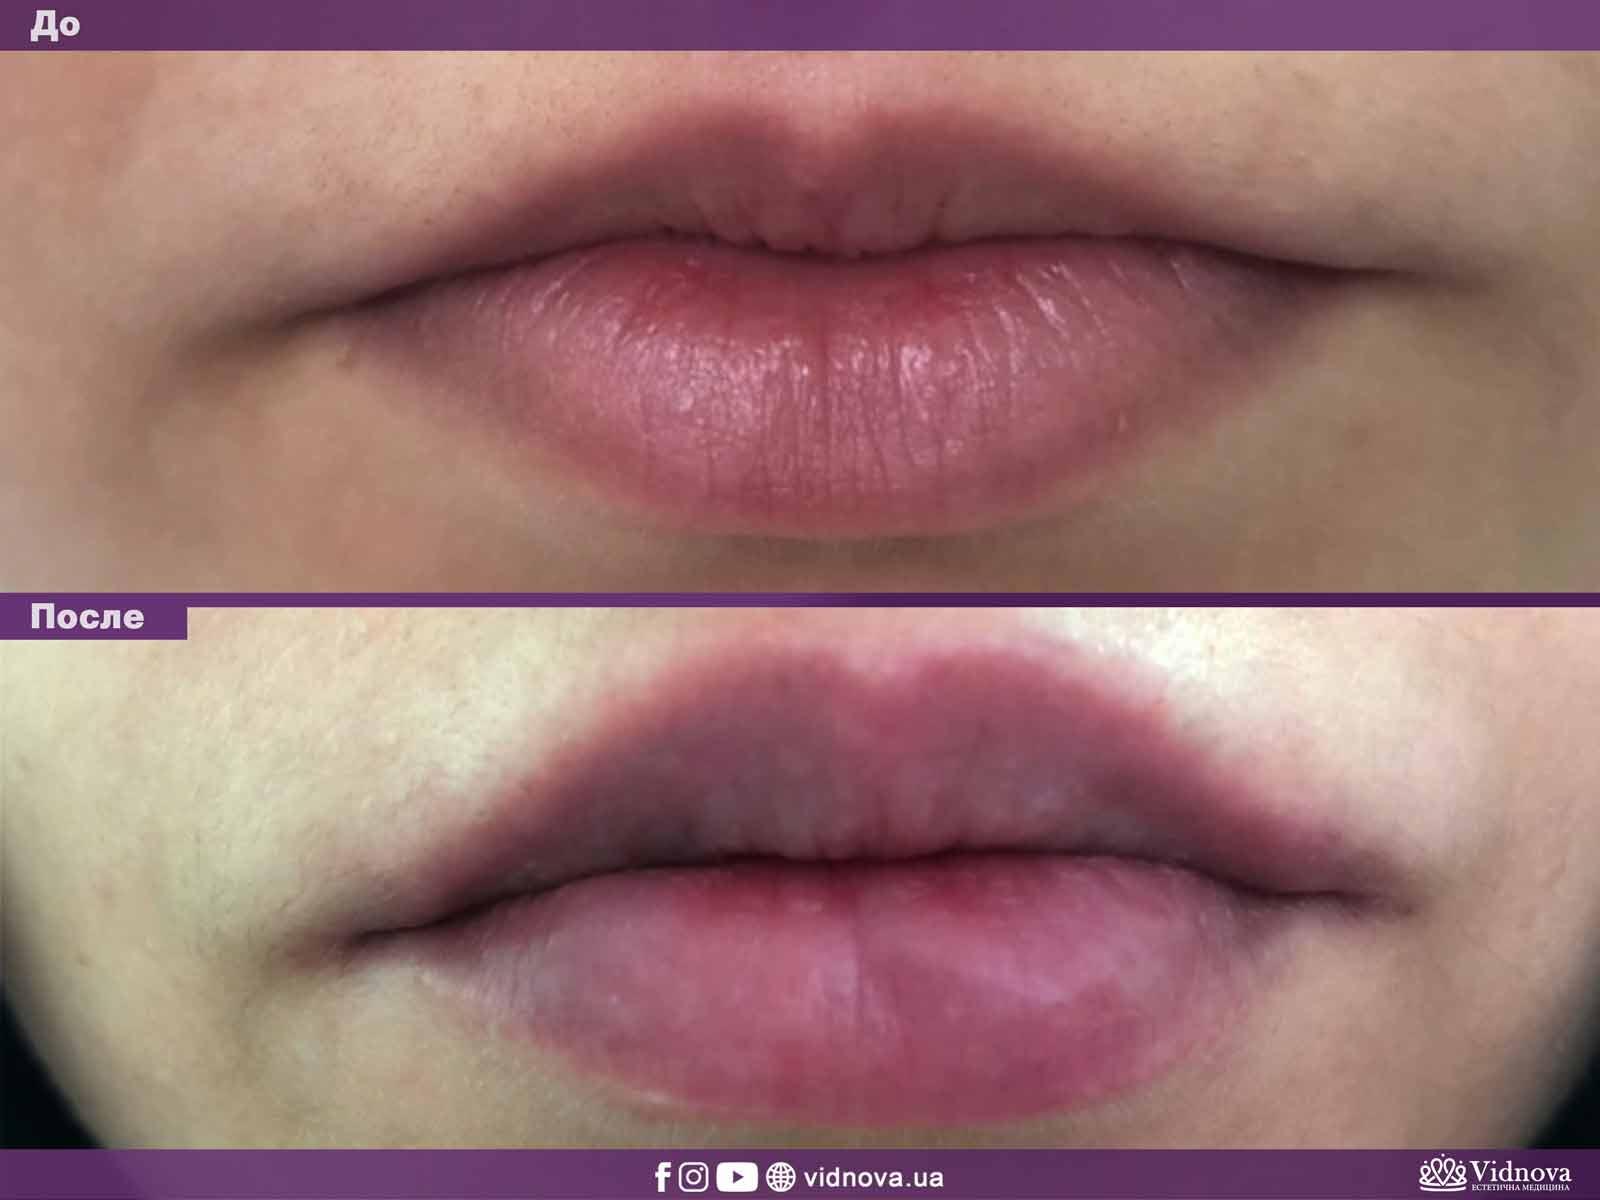 Увеличение губ: Фото До и После - Пример №12-1 - Клиника Vidnova